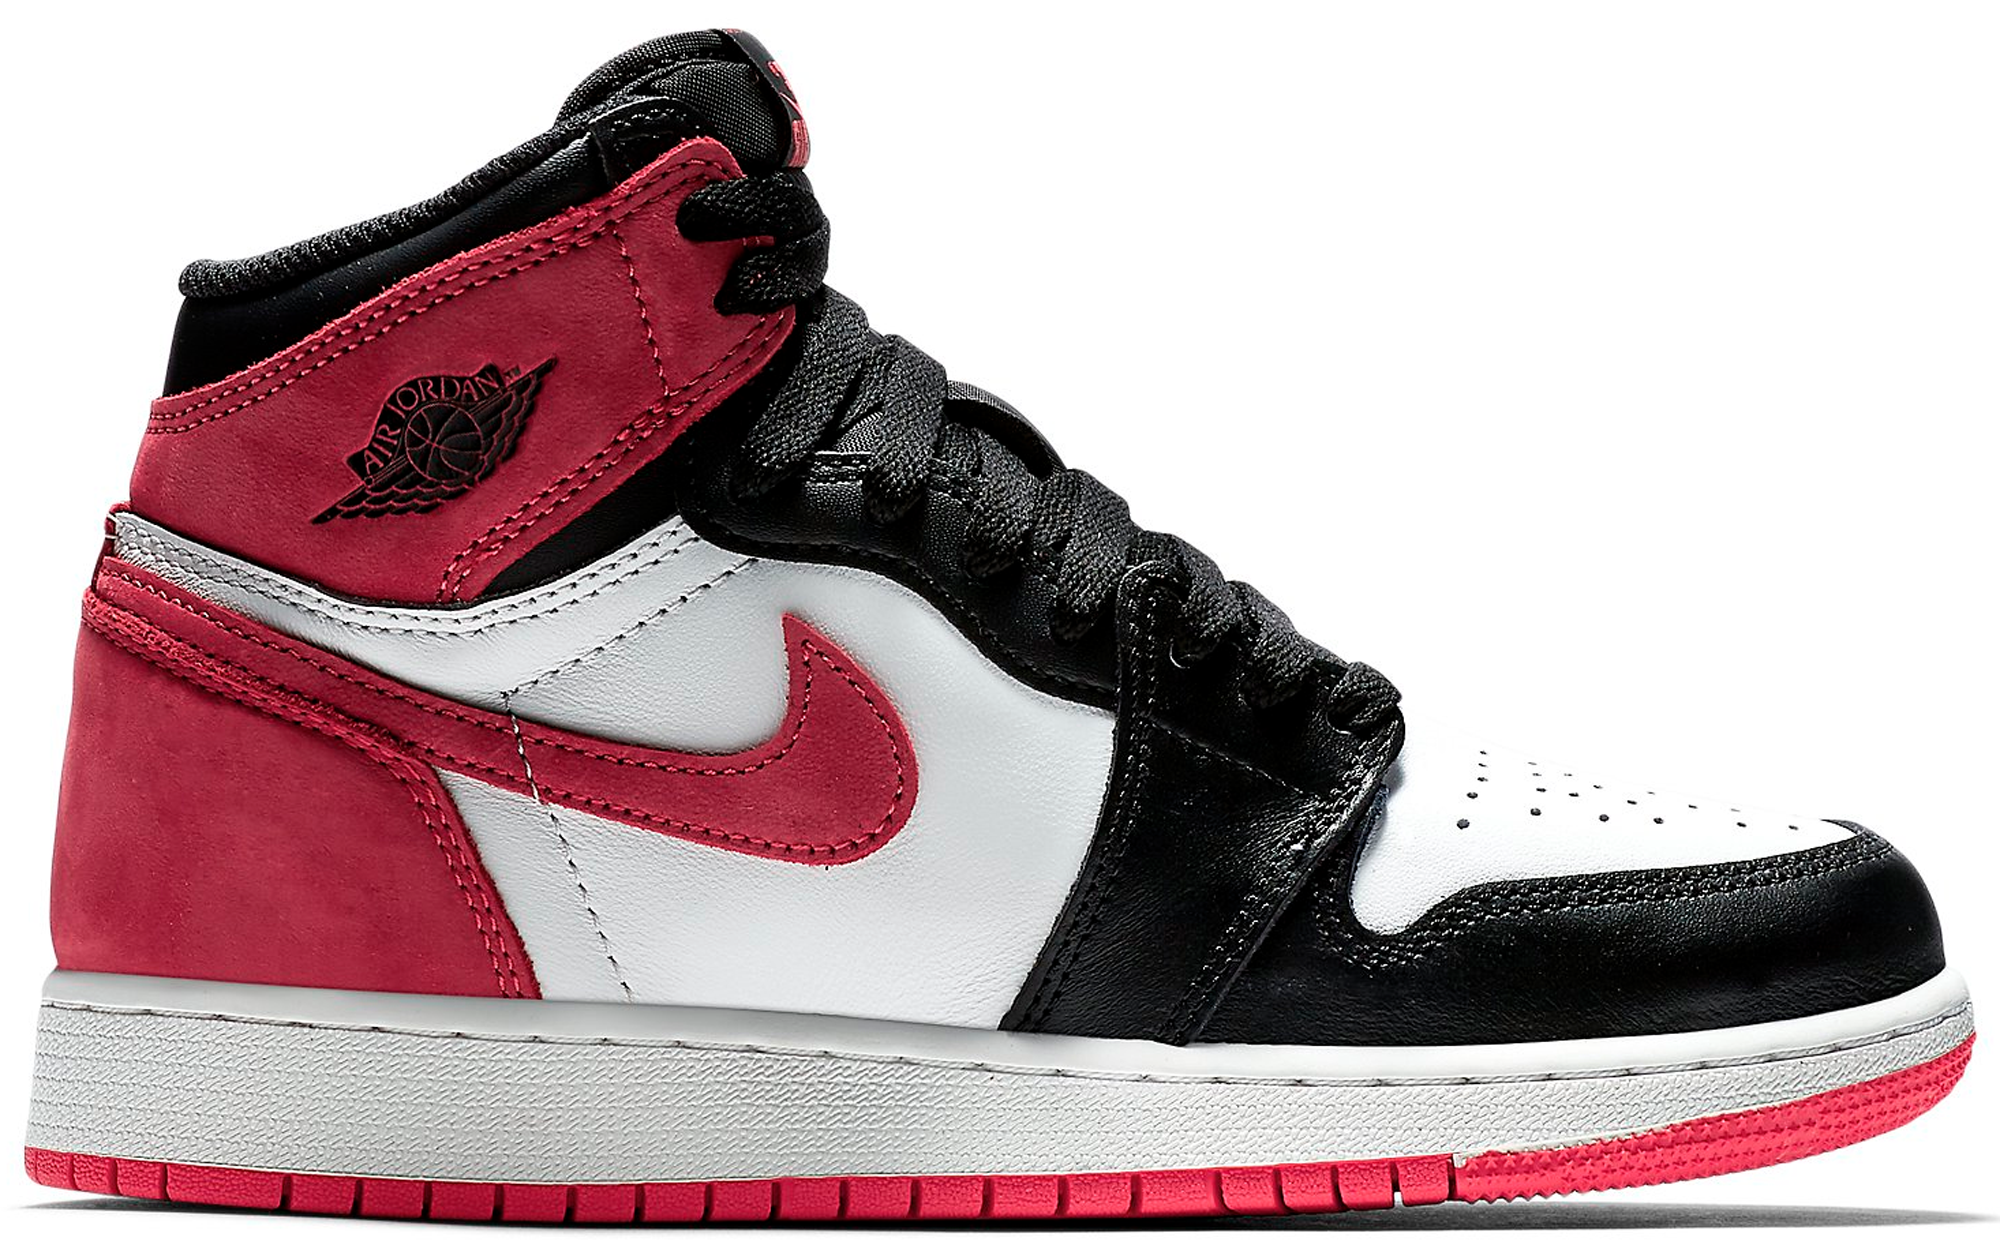 Jordan 1 Retro High Track Red (GS)